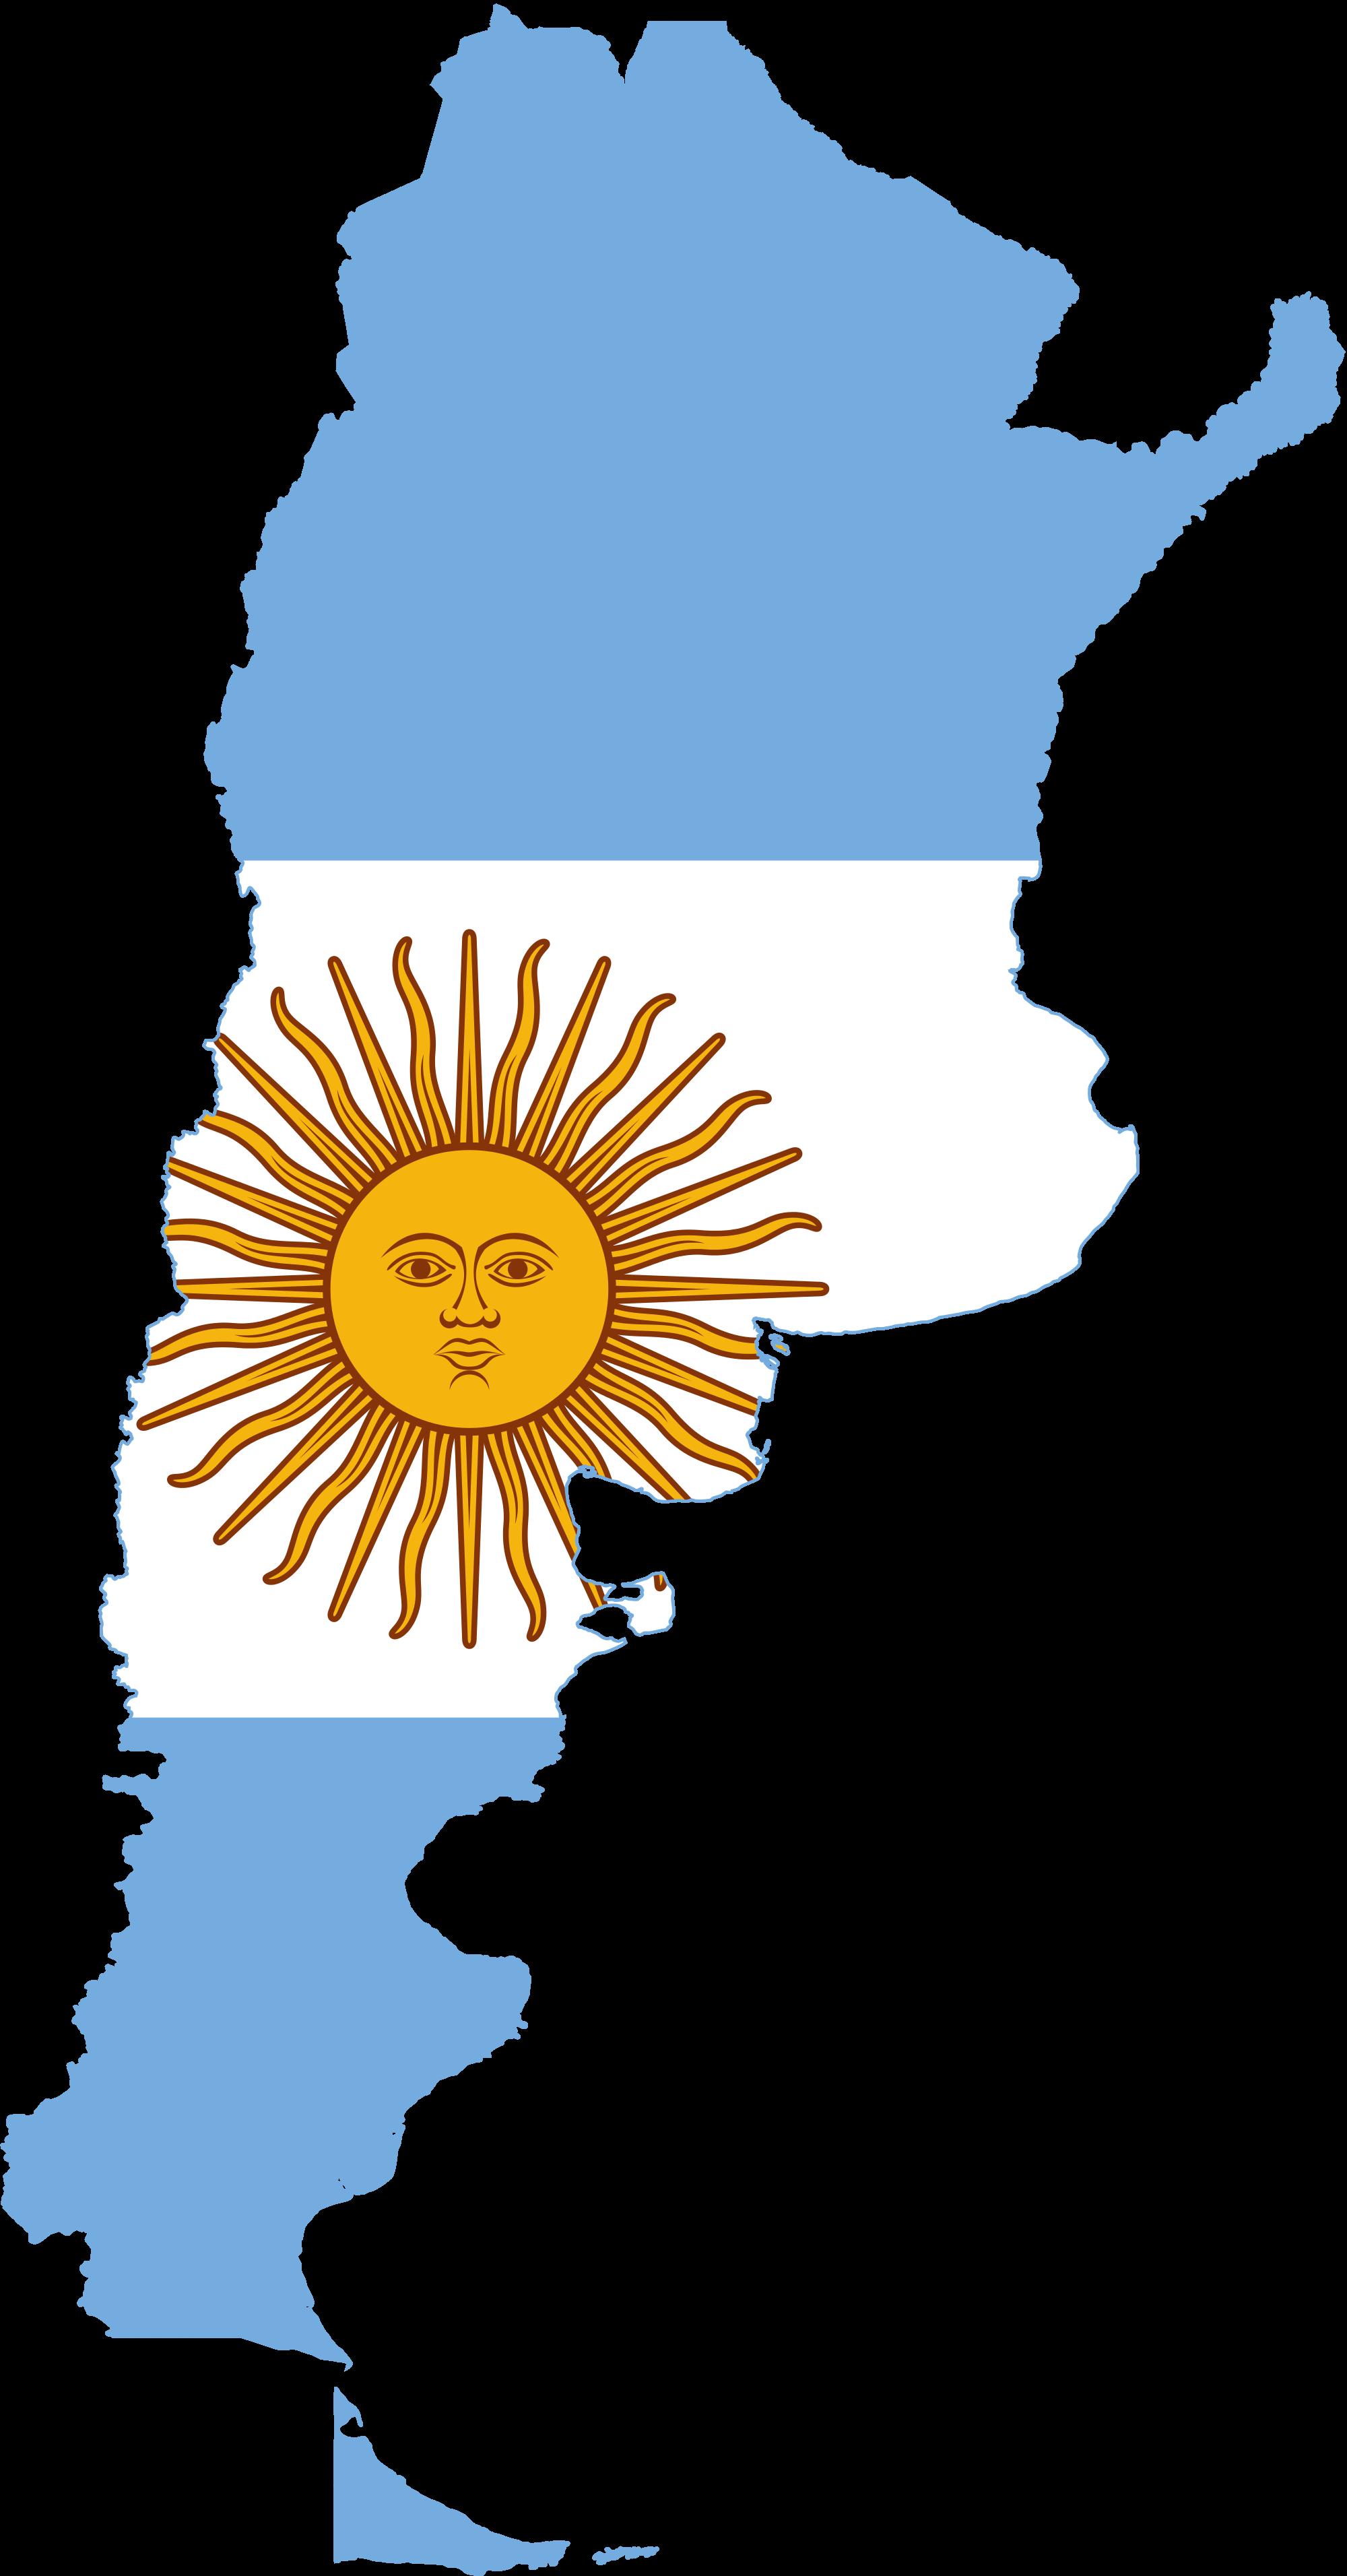 Argentina clipart Argentina Map Clipart #9